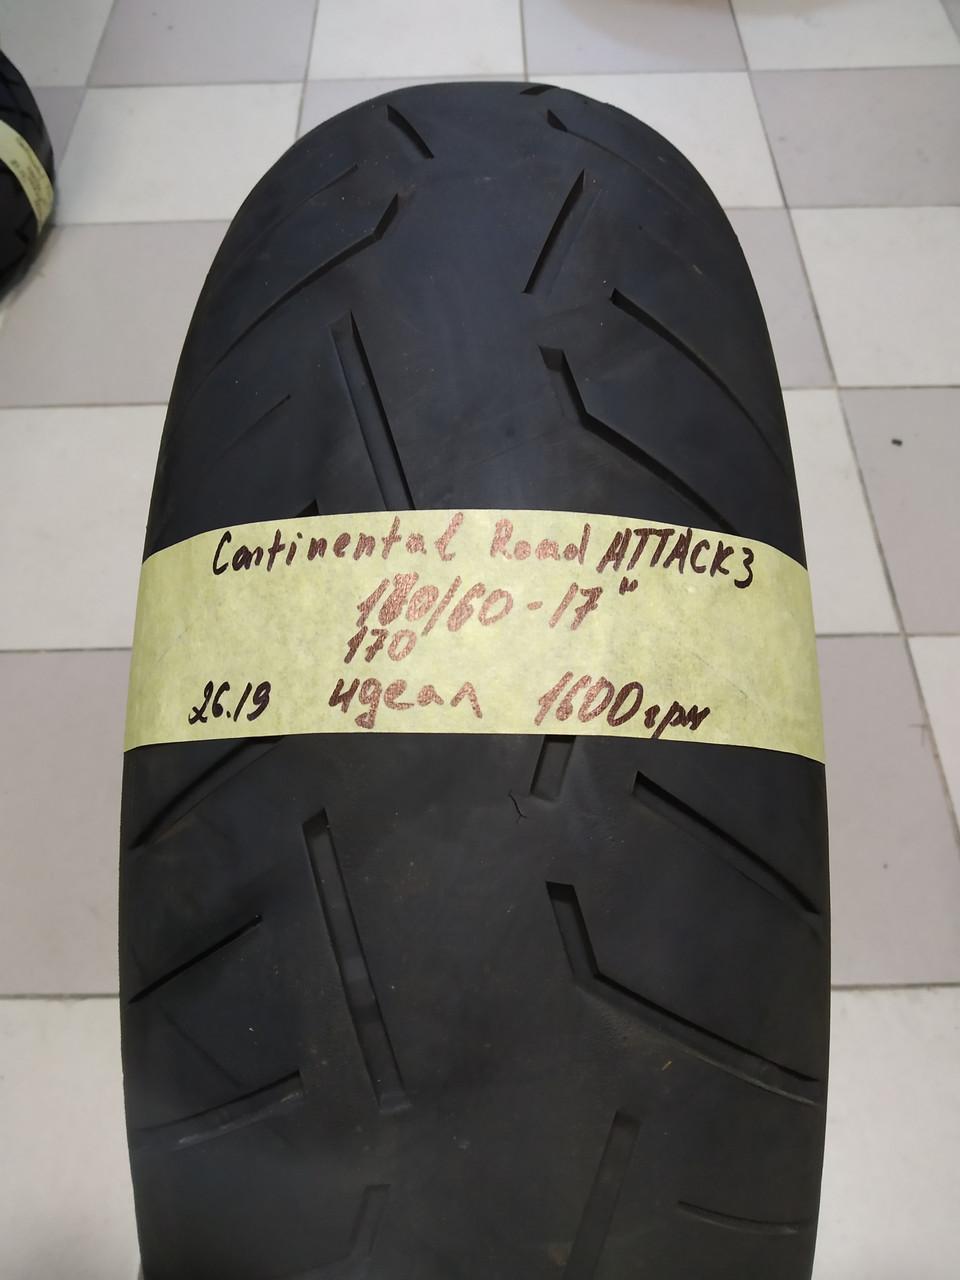 Continental Road Attack3 170 80 17  (26.19)  мото резина покрышка колесо шина